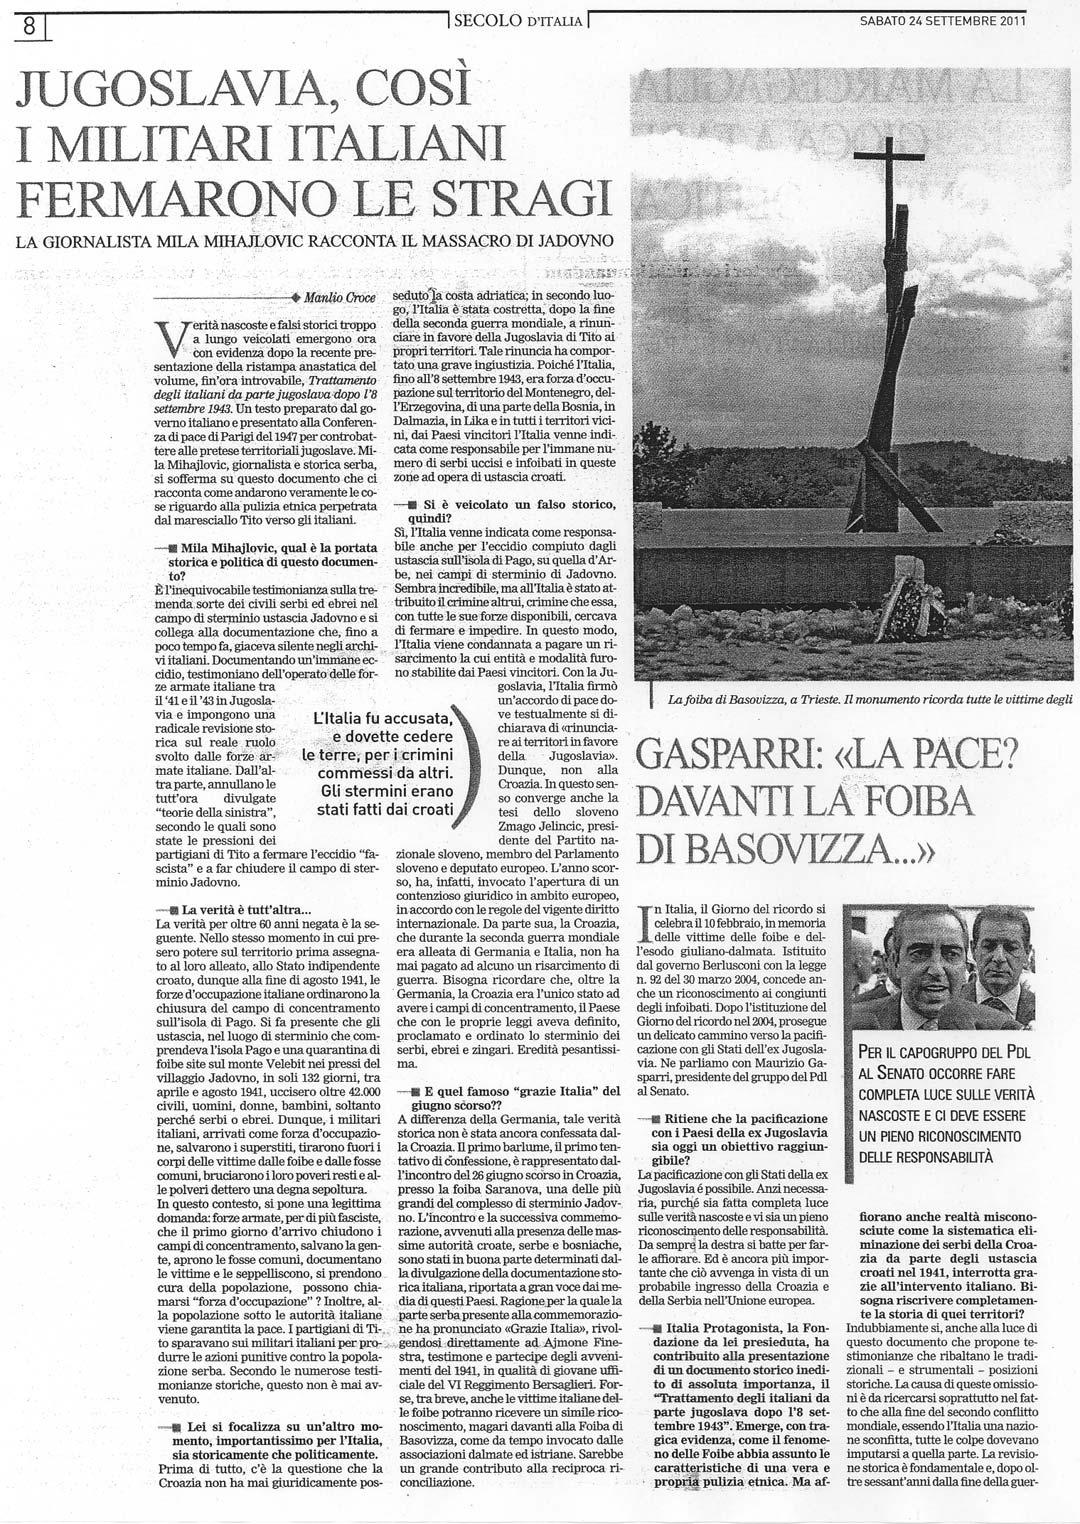 "Objavljeno u italijanskom listu ""Il Secolo d'Italia"", 24. septembra 2011."